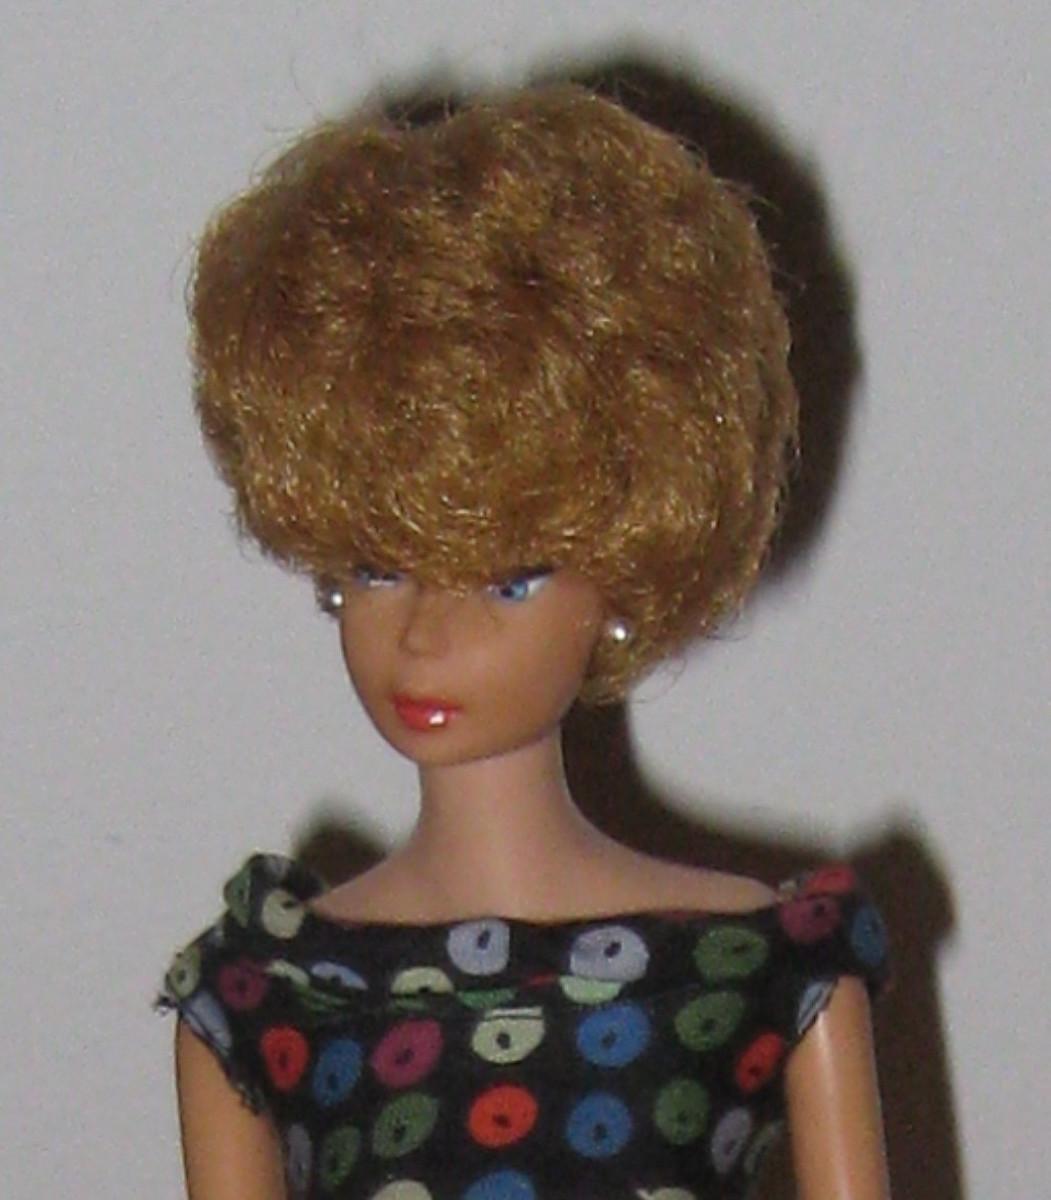 Barbie Doll History 1959 1972 Hobbylark Games And Hobbies